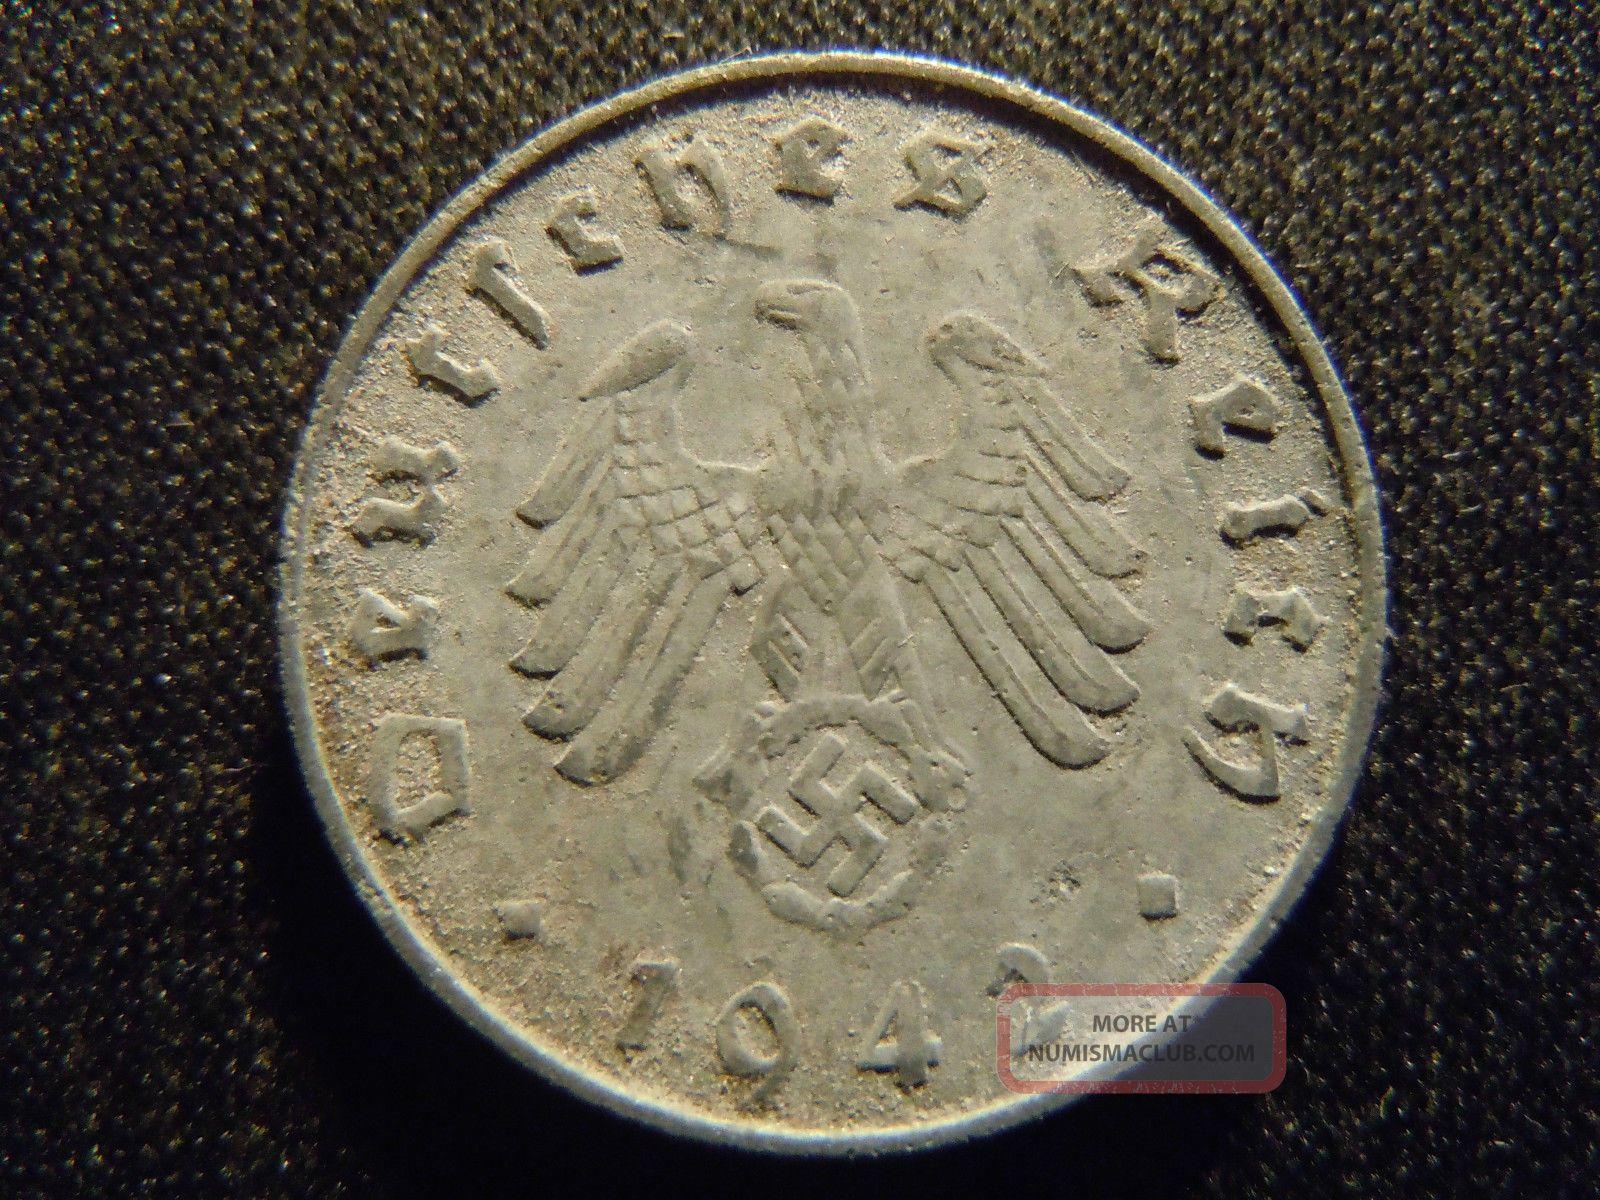 1942 german coin